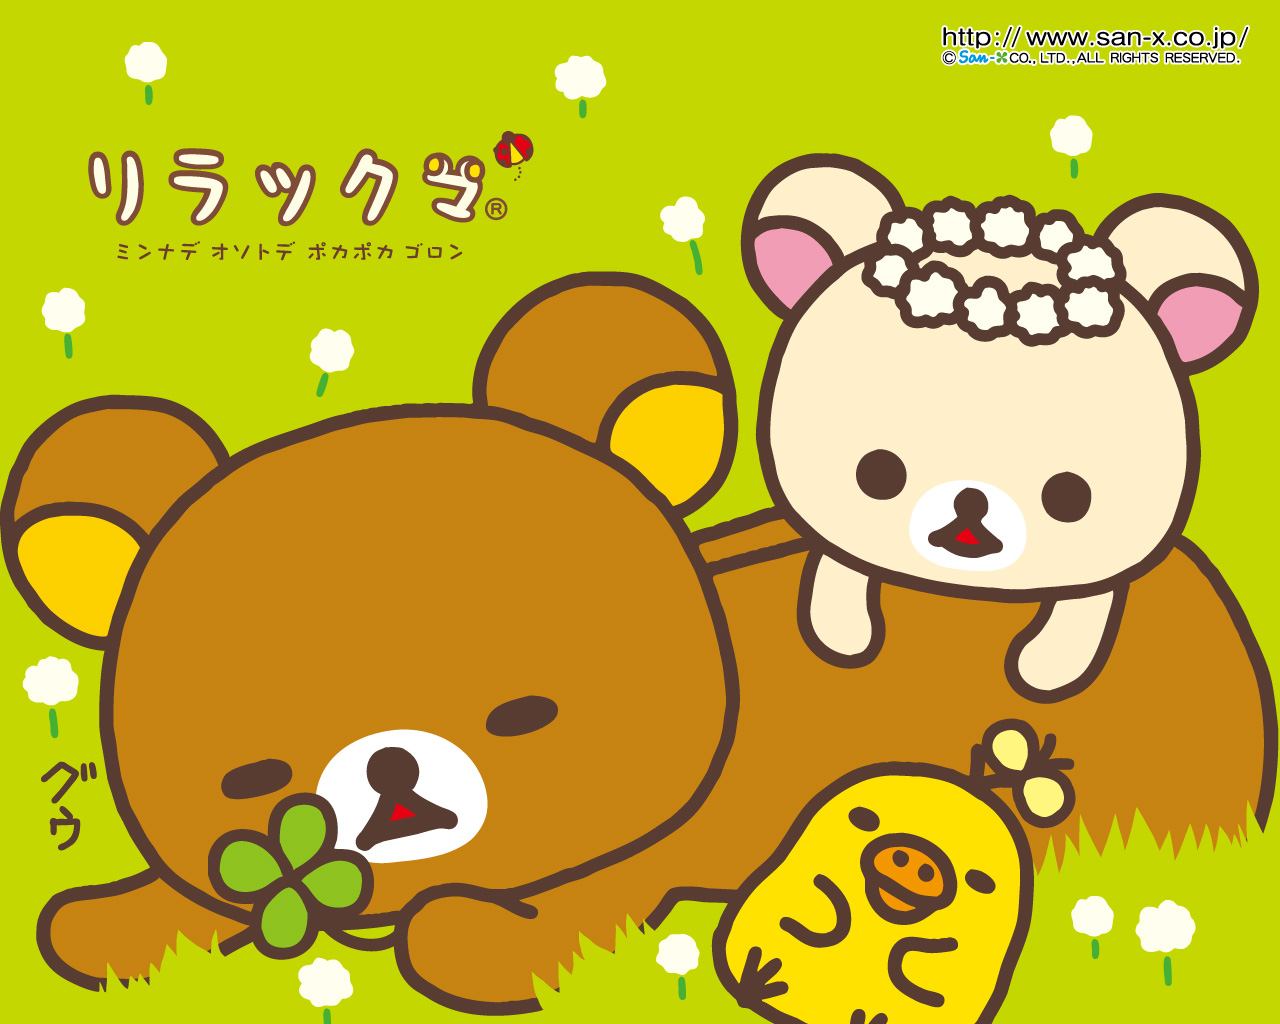 Kawaii Iphone 4 Wallpaper 鬆弛熊 Rilakkuma 頁 1 ♀tracy♂ 卡通桌布館 笨笨網站超級論壇 Powered